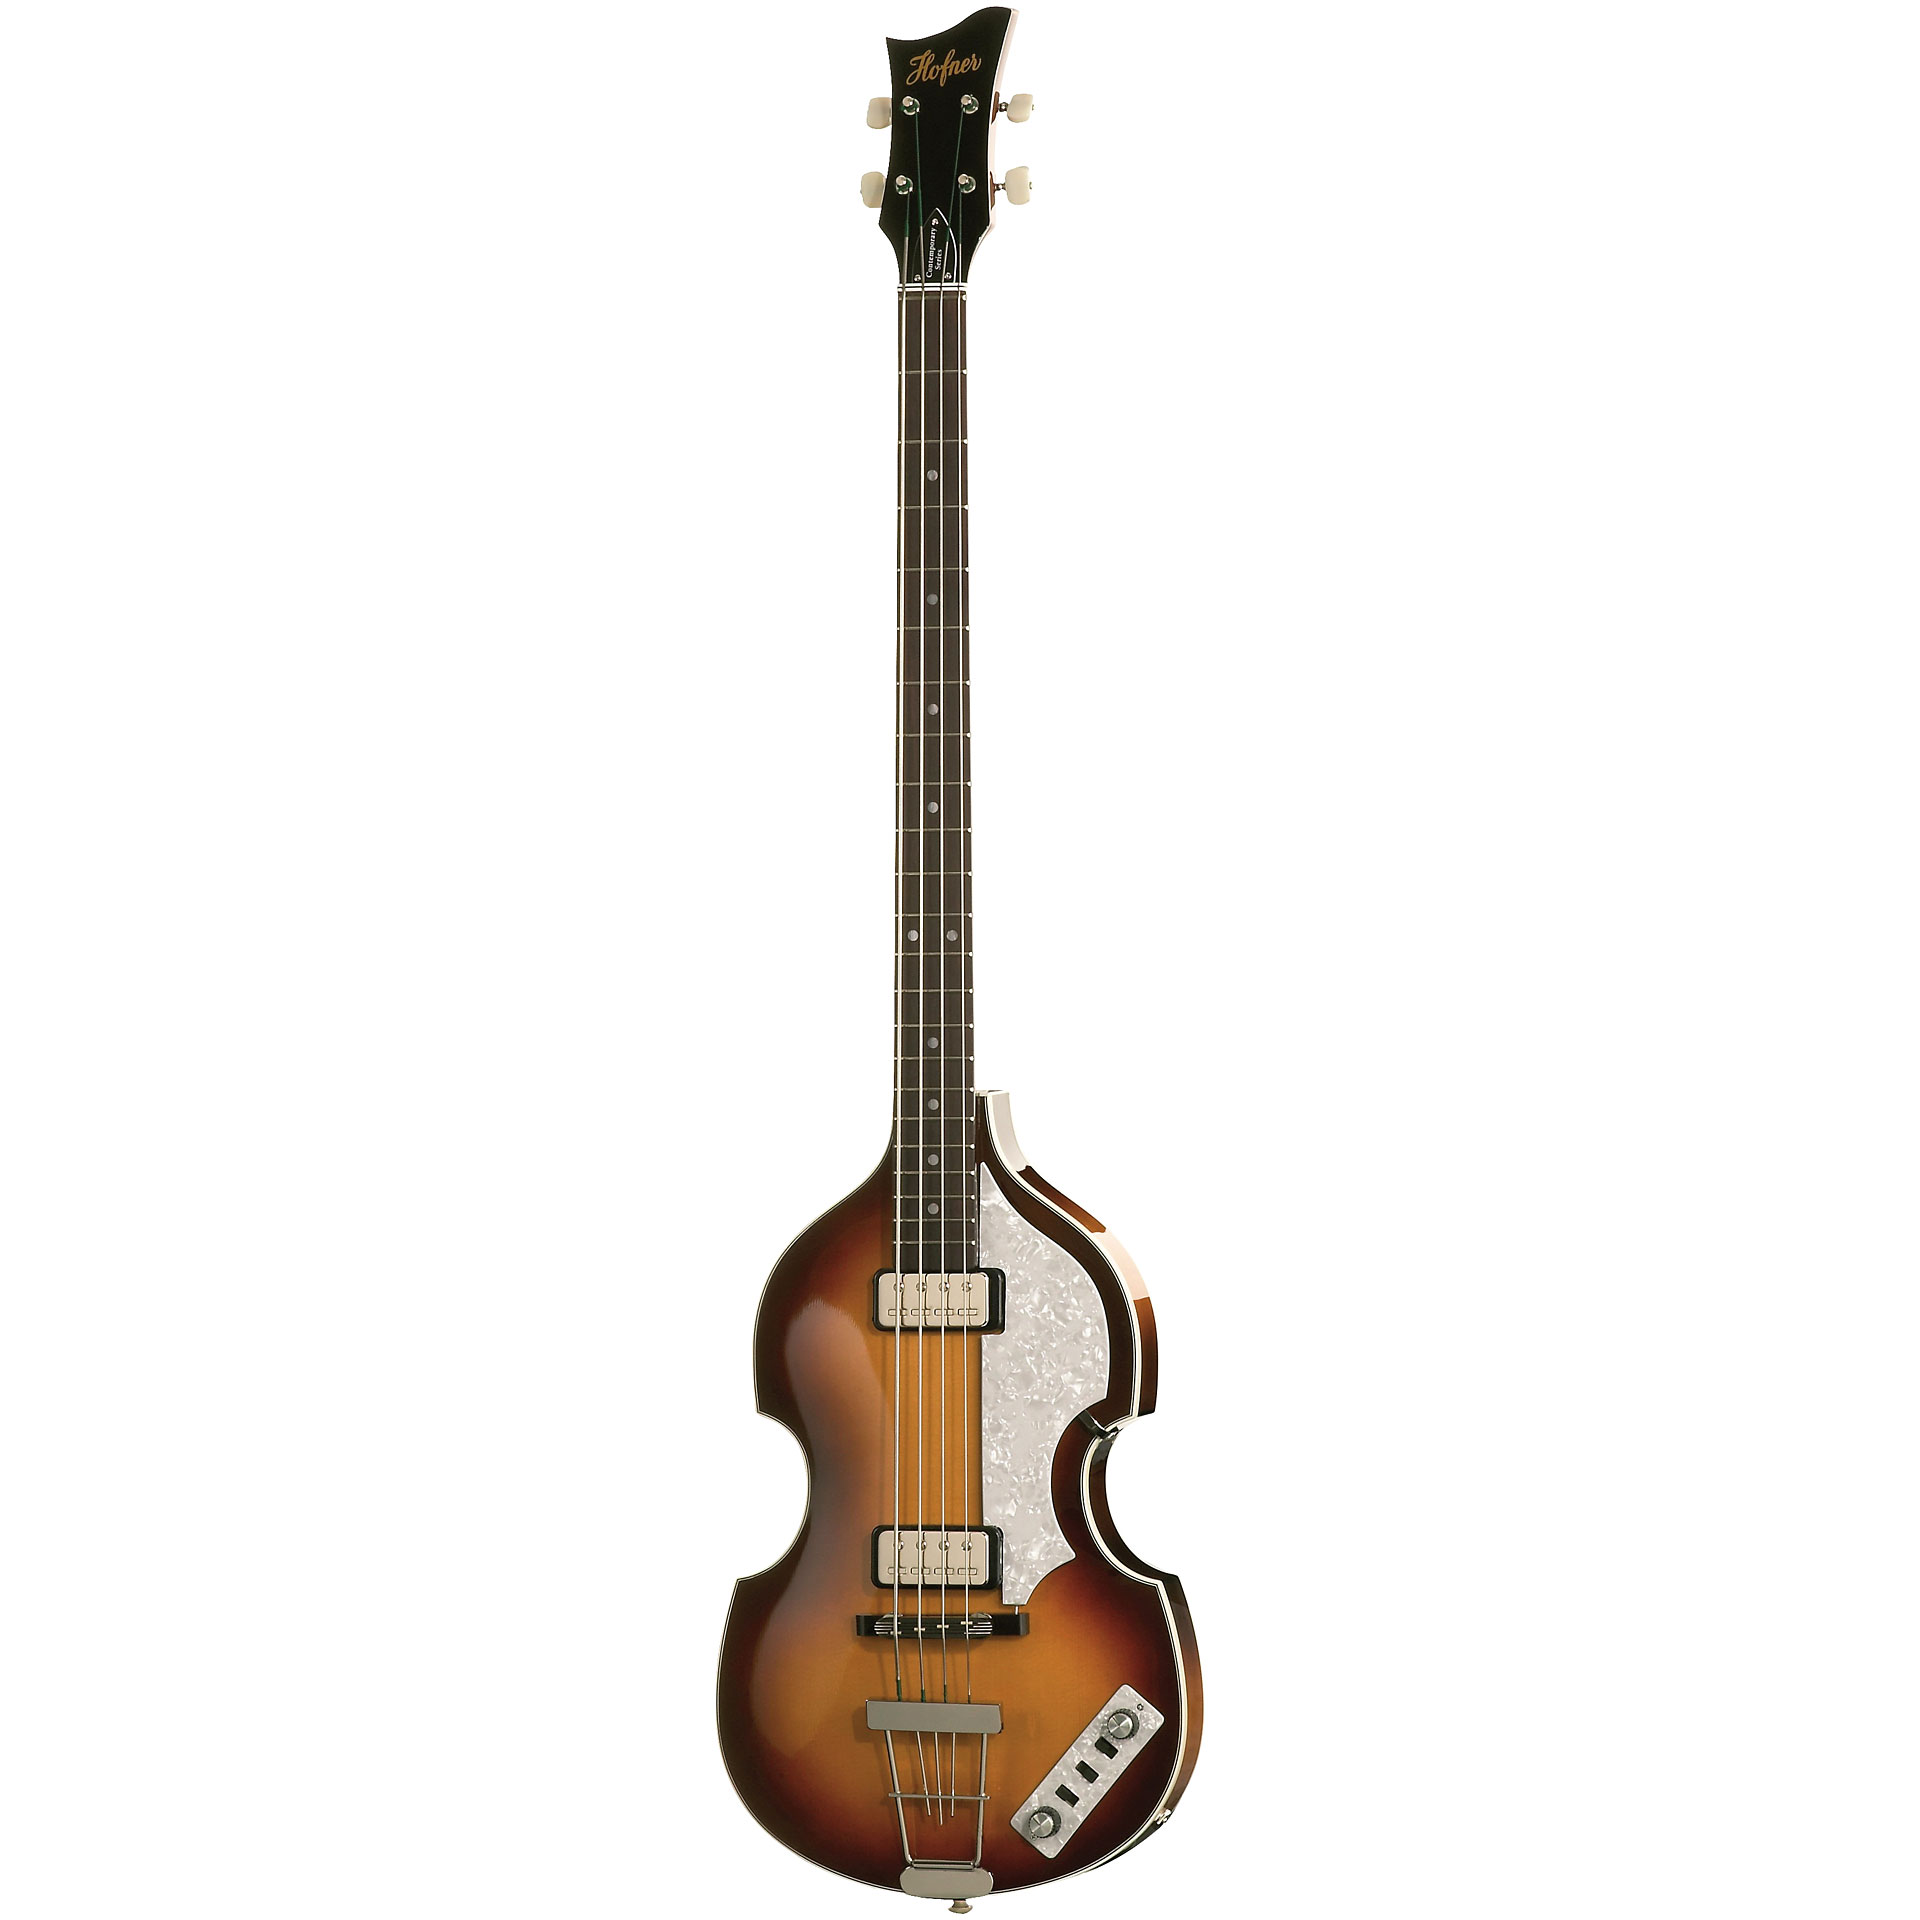 H 246 Fner Beatles Bass Hct 500 1 Sb 171 Electric Bass Guitar